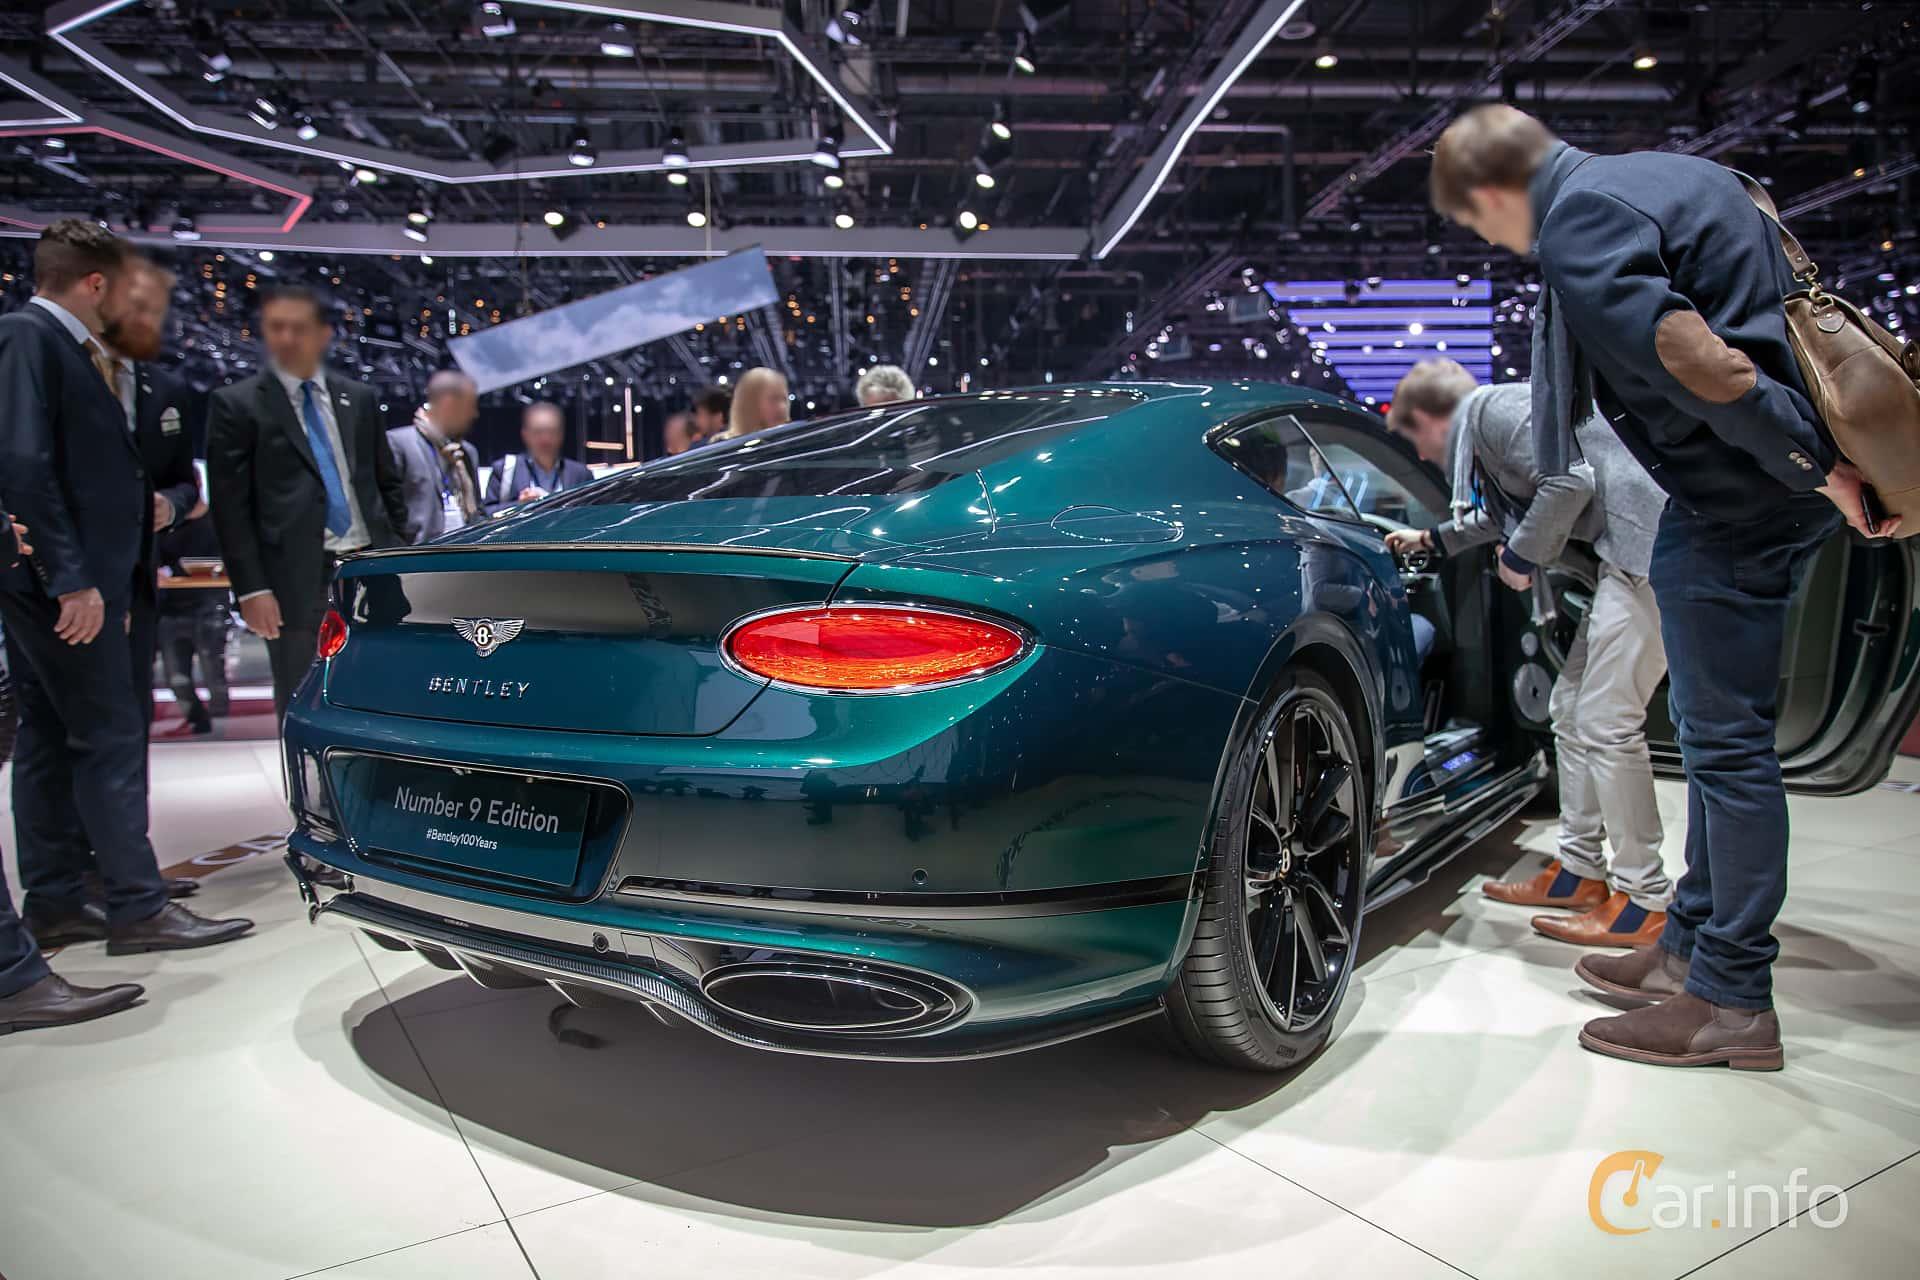 Bentley Continental GT 6.0 W12 TSI DCT, 635hp, 2019 at Geneva Motor Show 2019